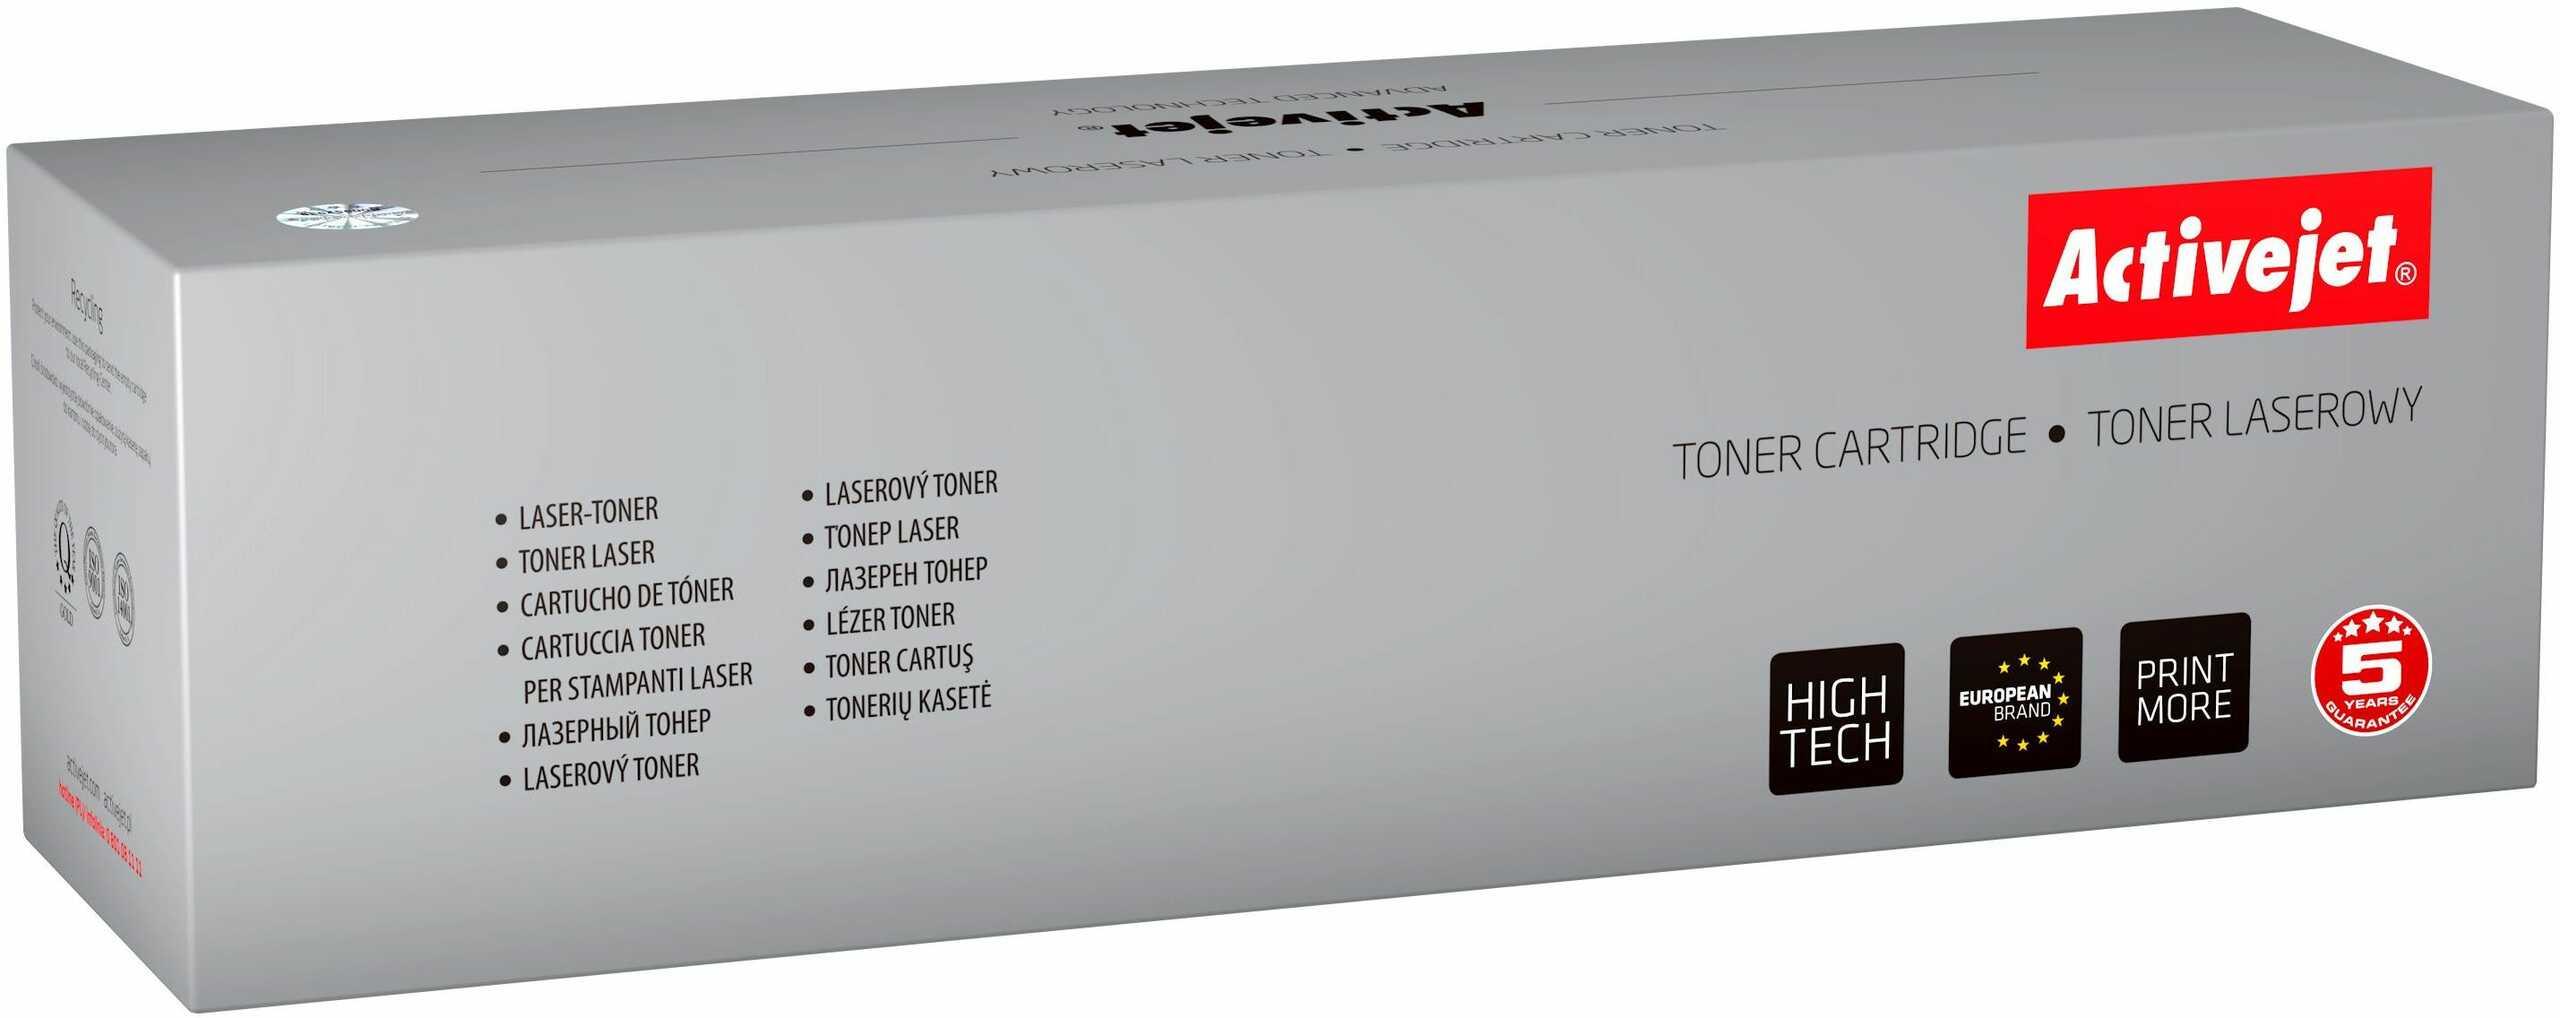 Toner Activejet ATM-211N (zamiennik Konica Minolta TN211; Supreme; 17 000 stron; czarny)